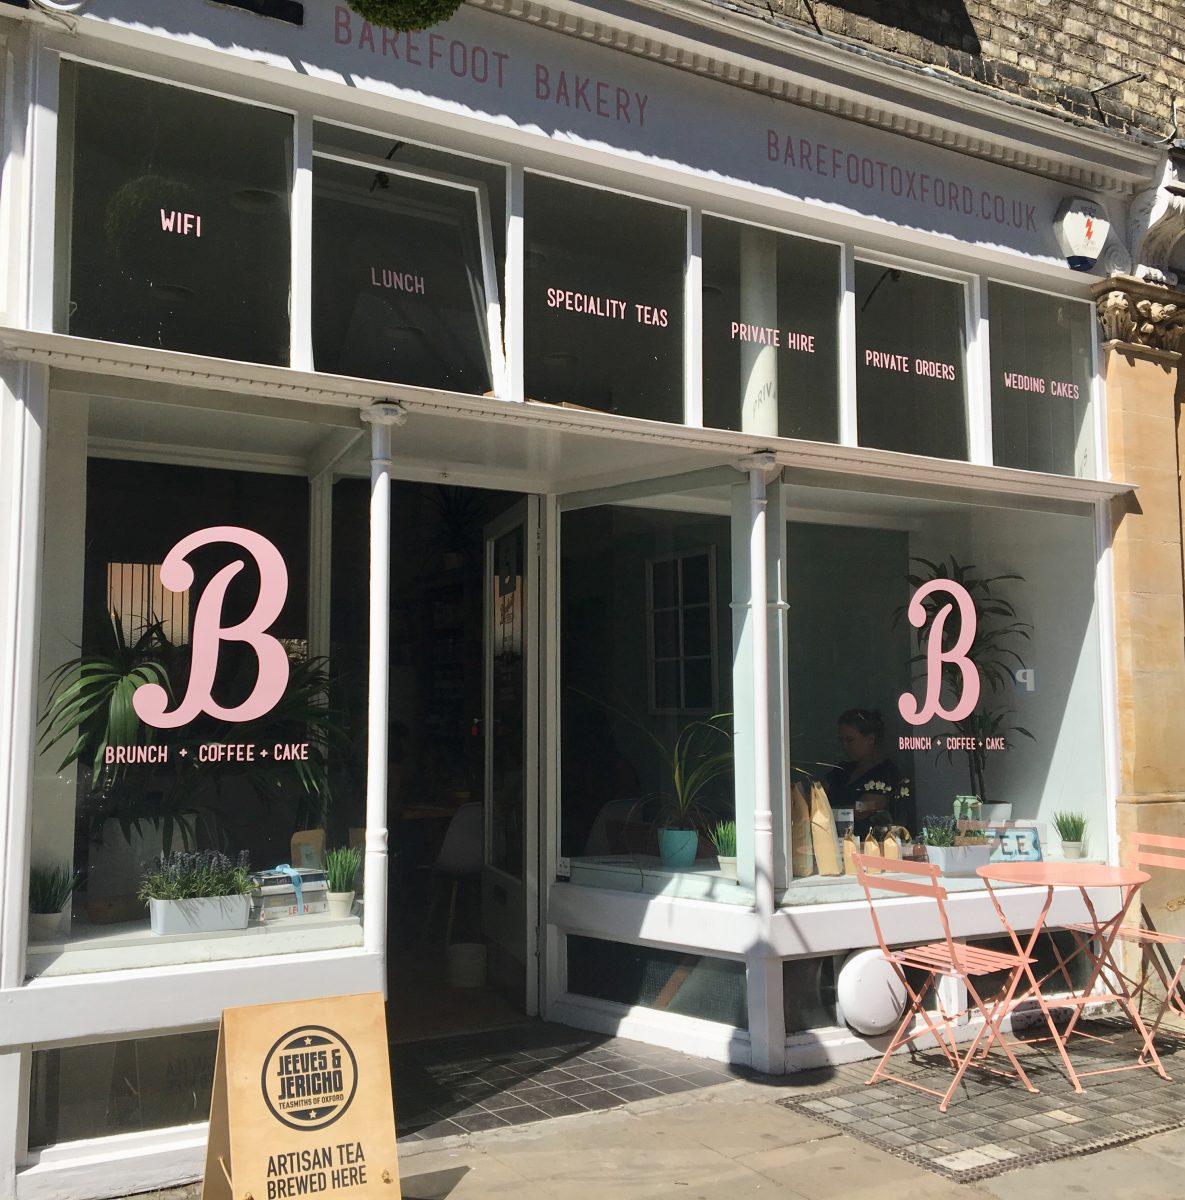 Barefoot Cafe King Edward Street   Image Credit Bitten Oxford